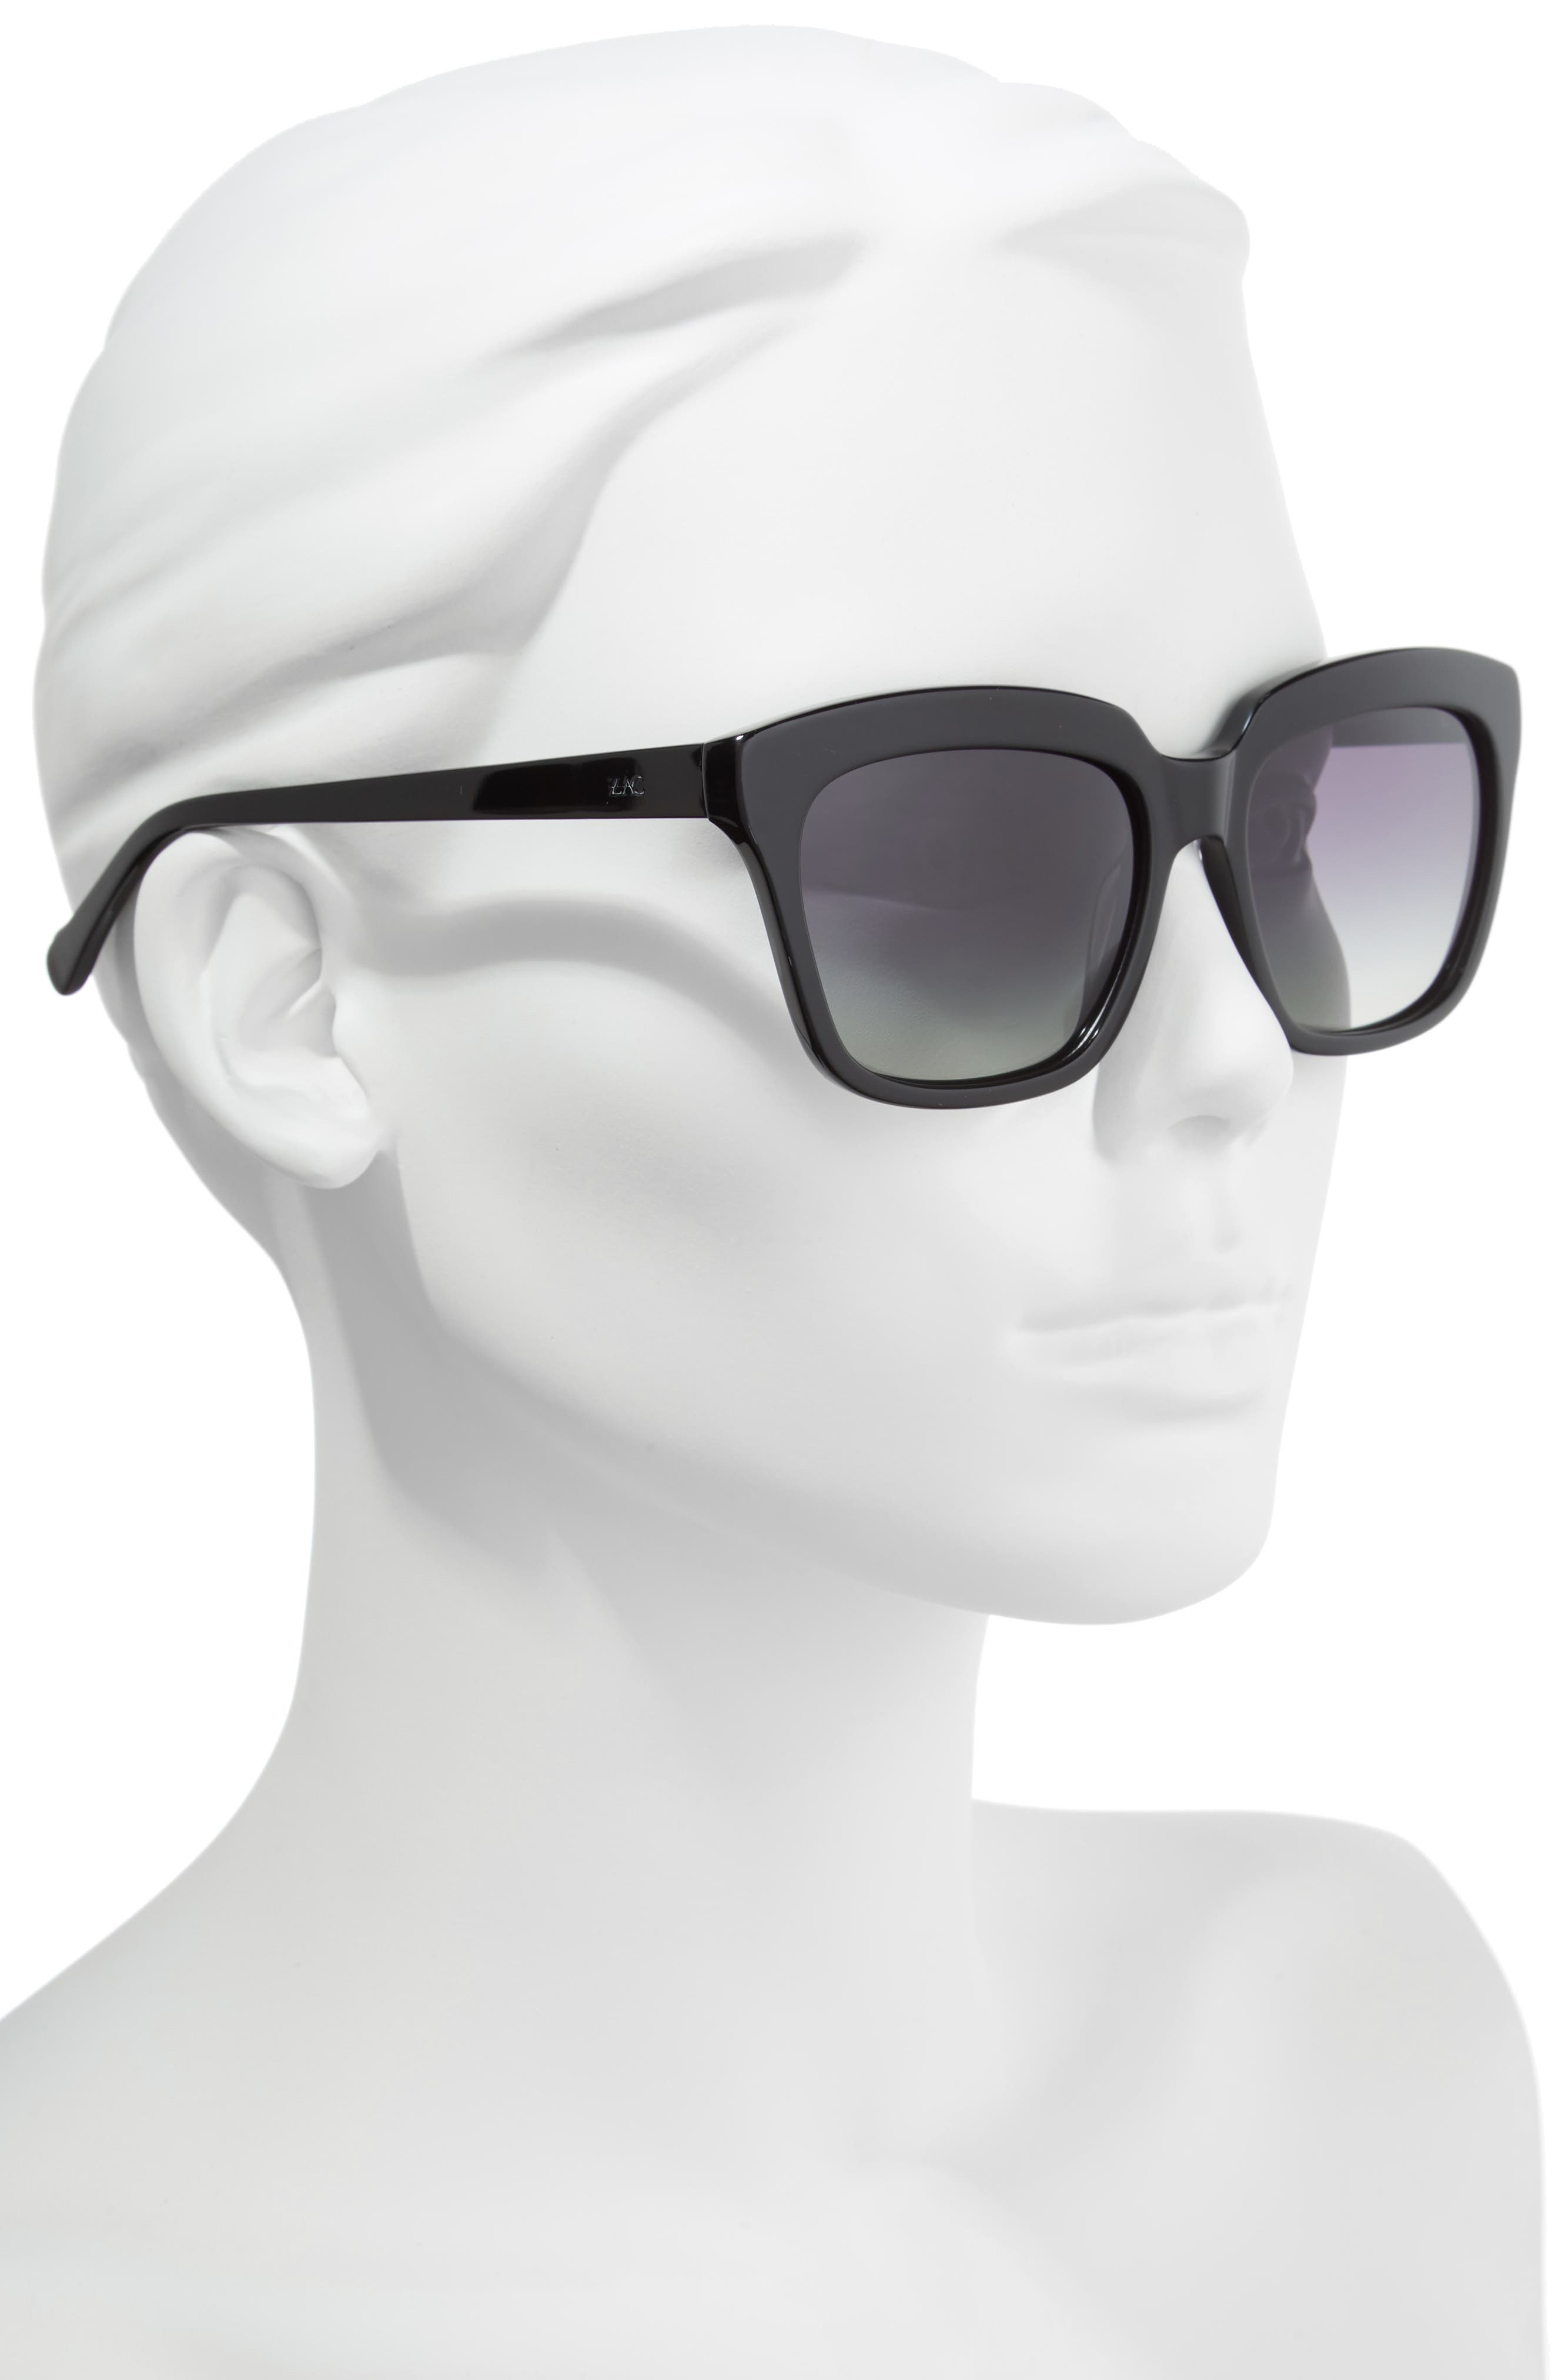 Adina 56mm Polarized Sunglasses,                             Alternate thumbnail 2, color,                             001